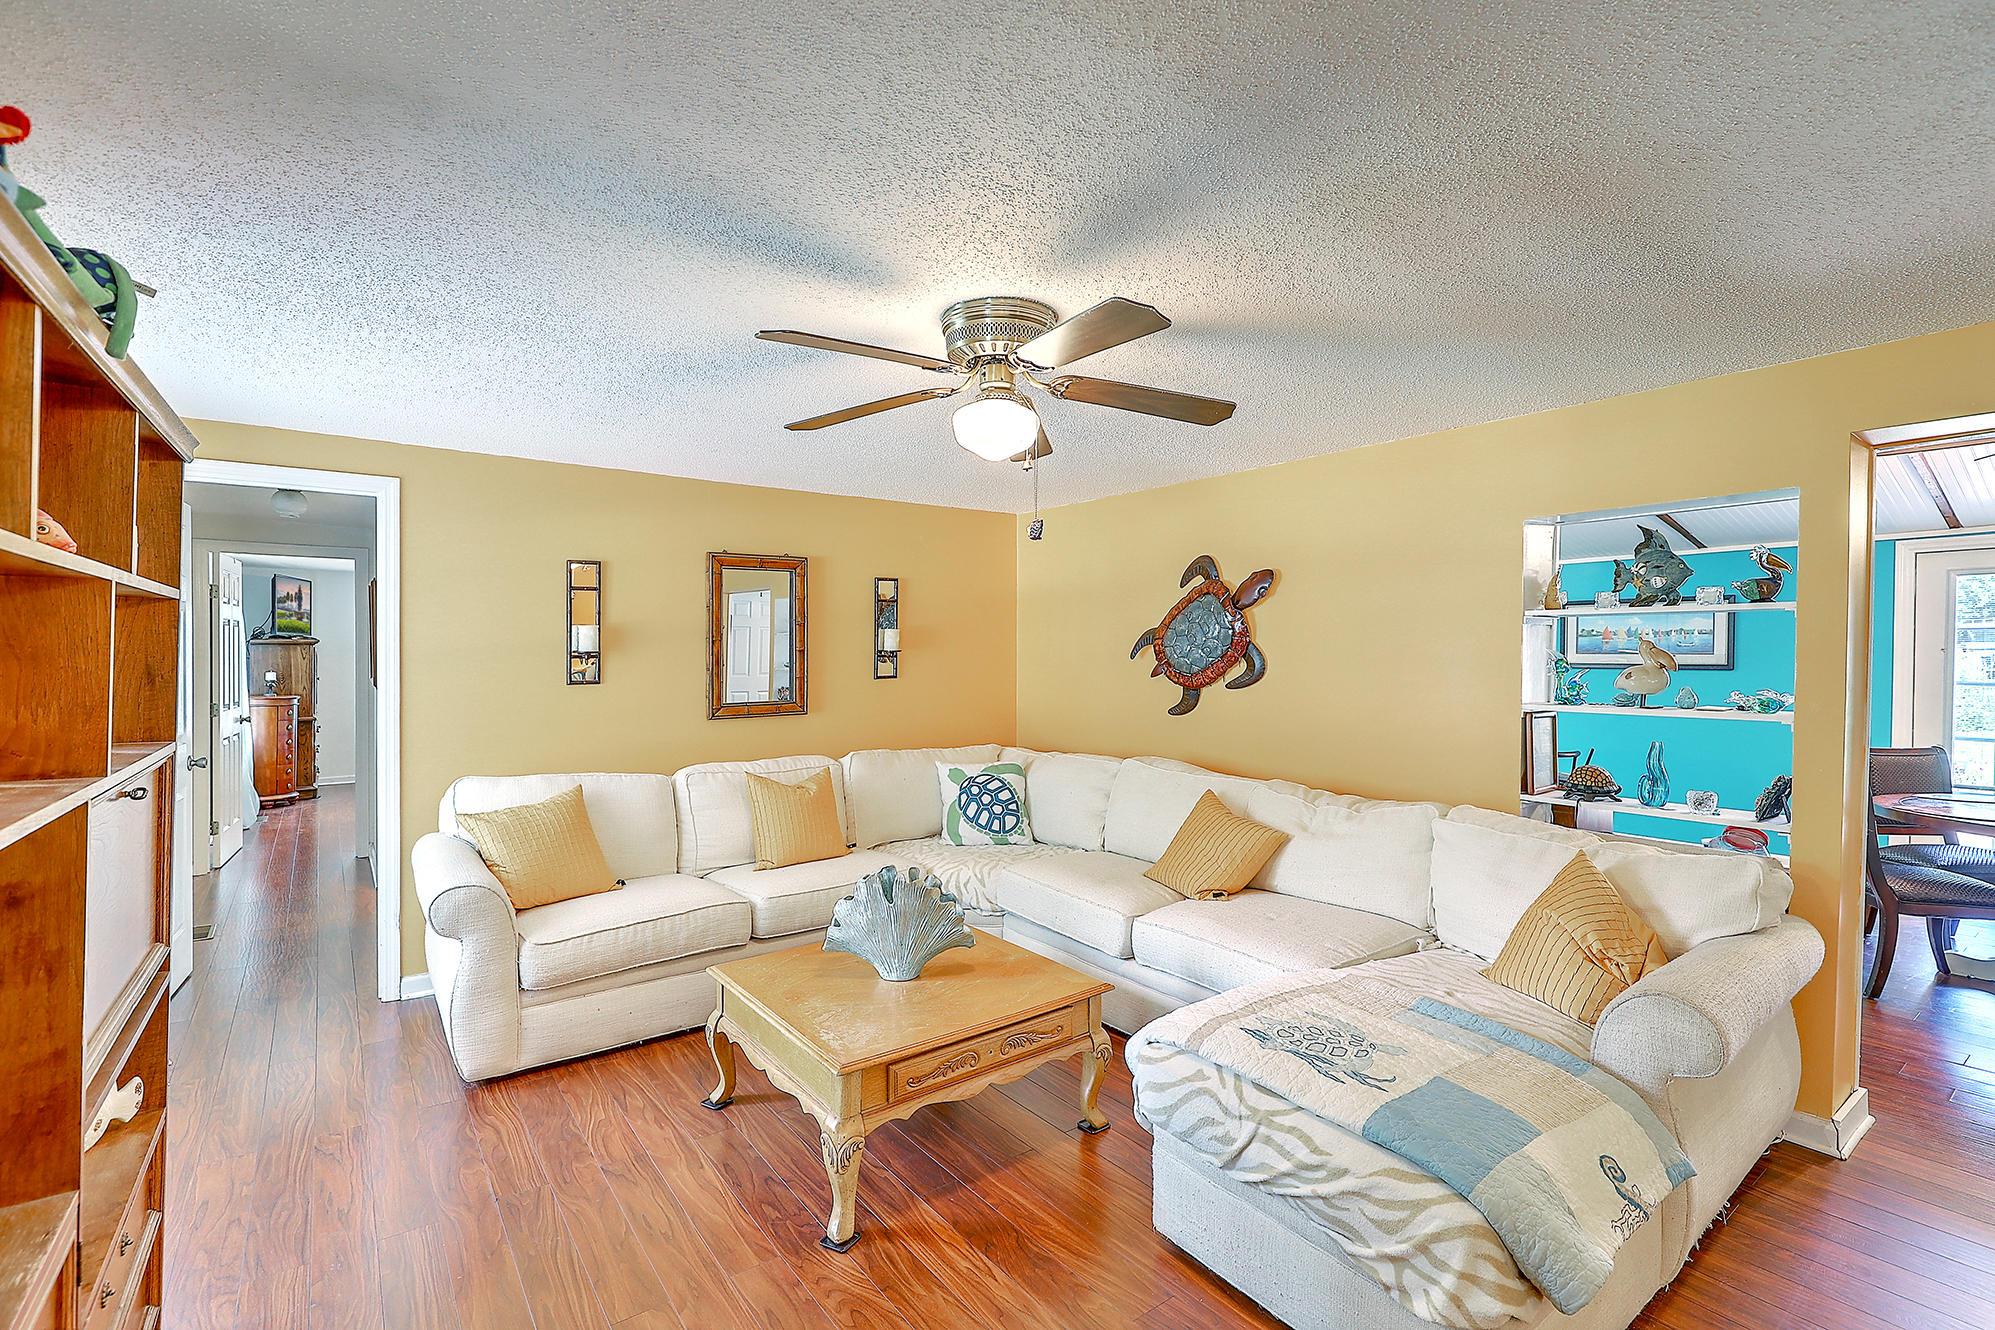 Cross Area (West) Homes For Sale - 128 Cherry Grove, Cross, SC - 31